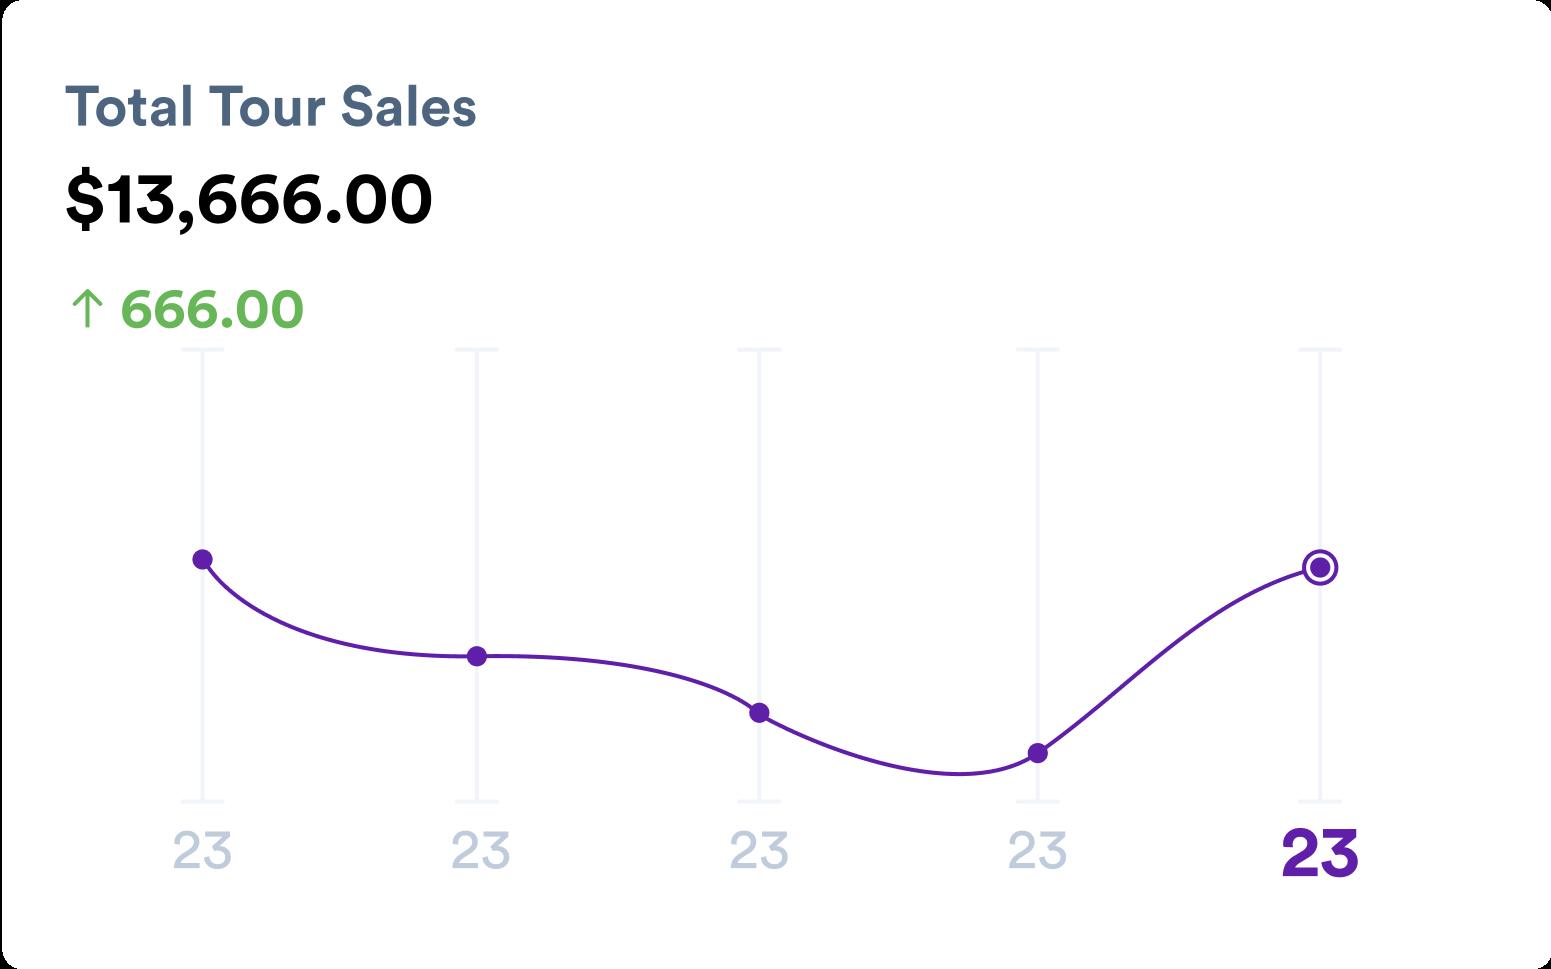 Product showcase image of tour sales